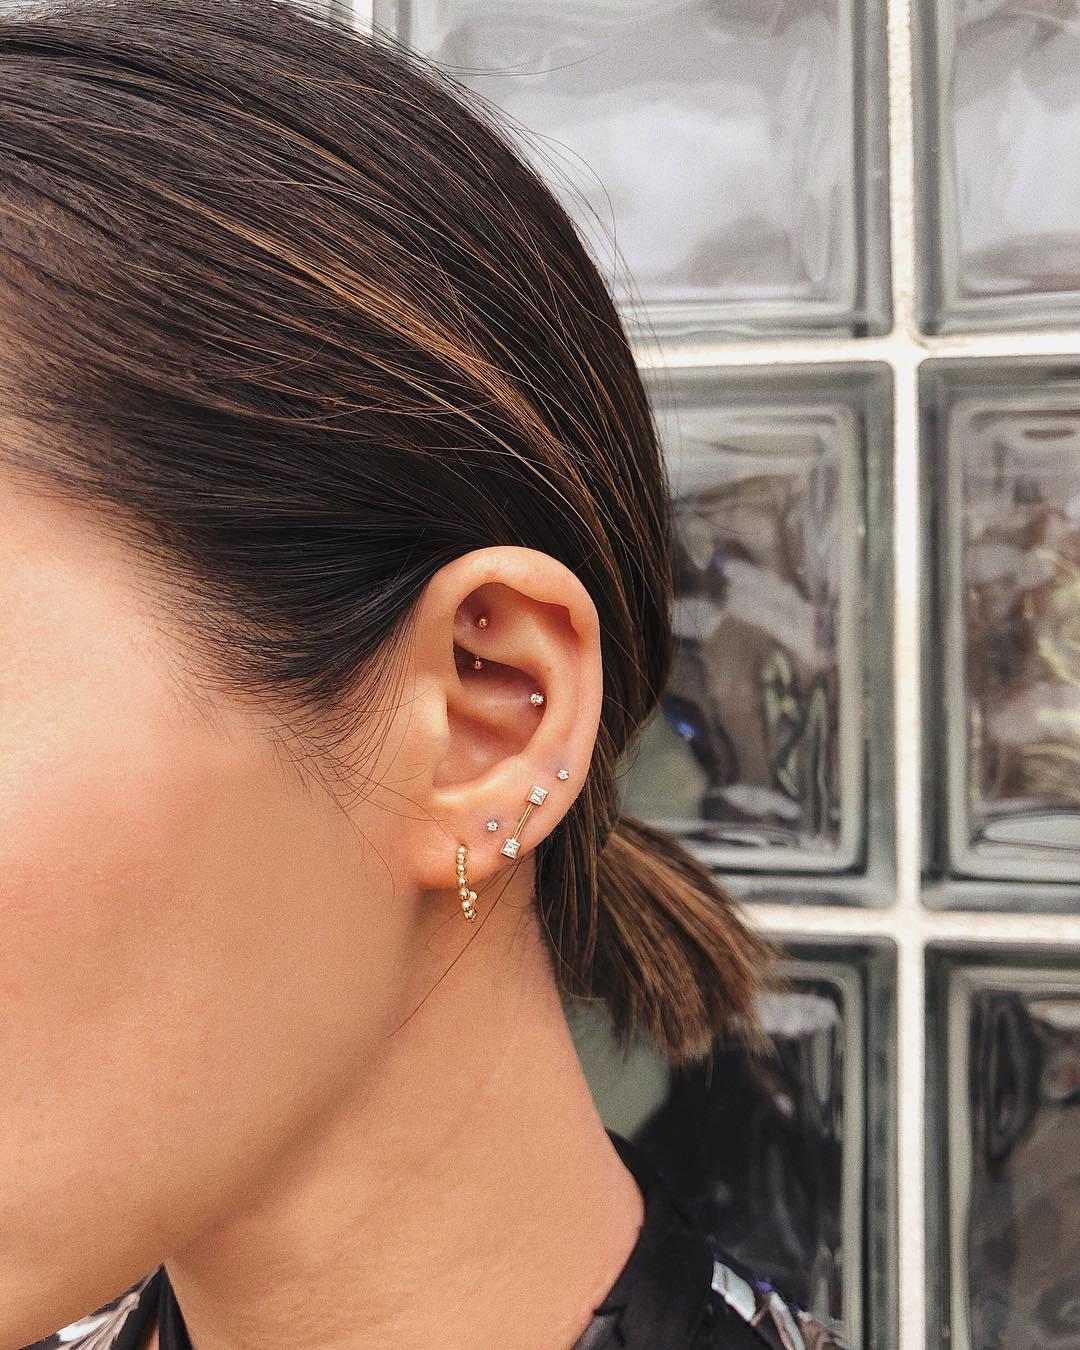 Piercings na orelha ponto de luz